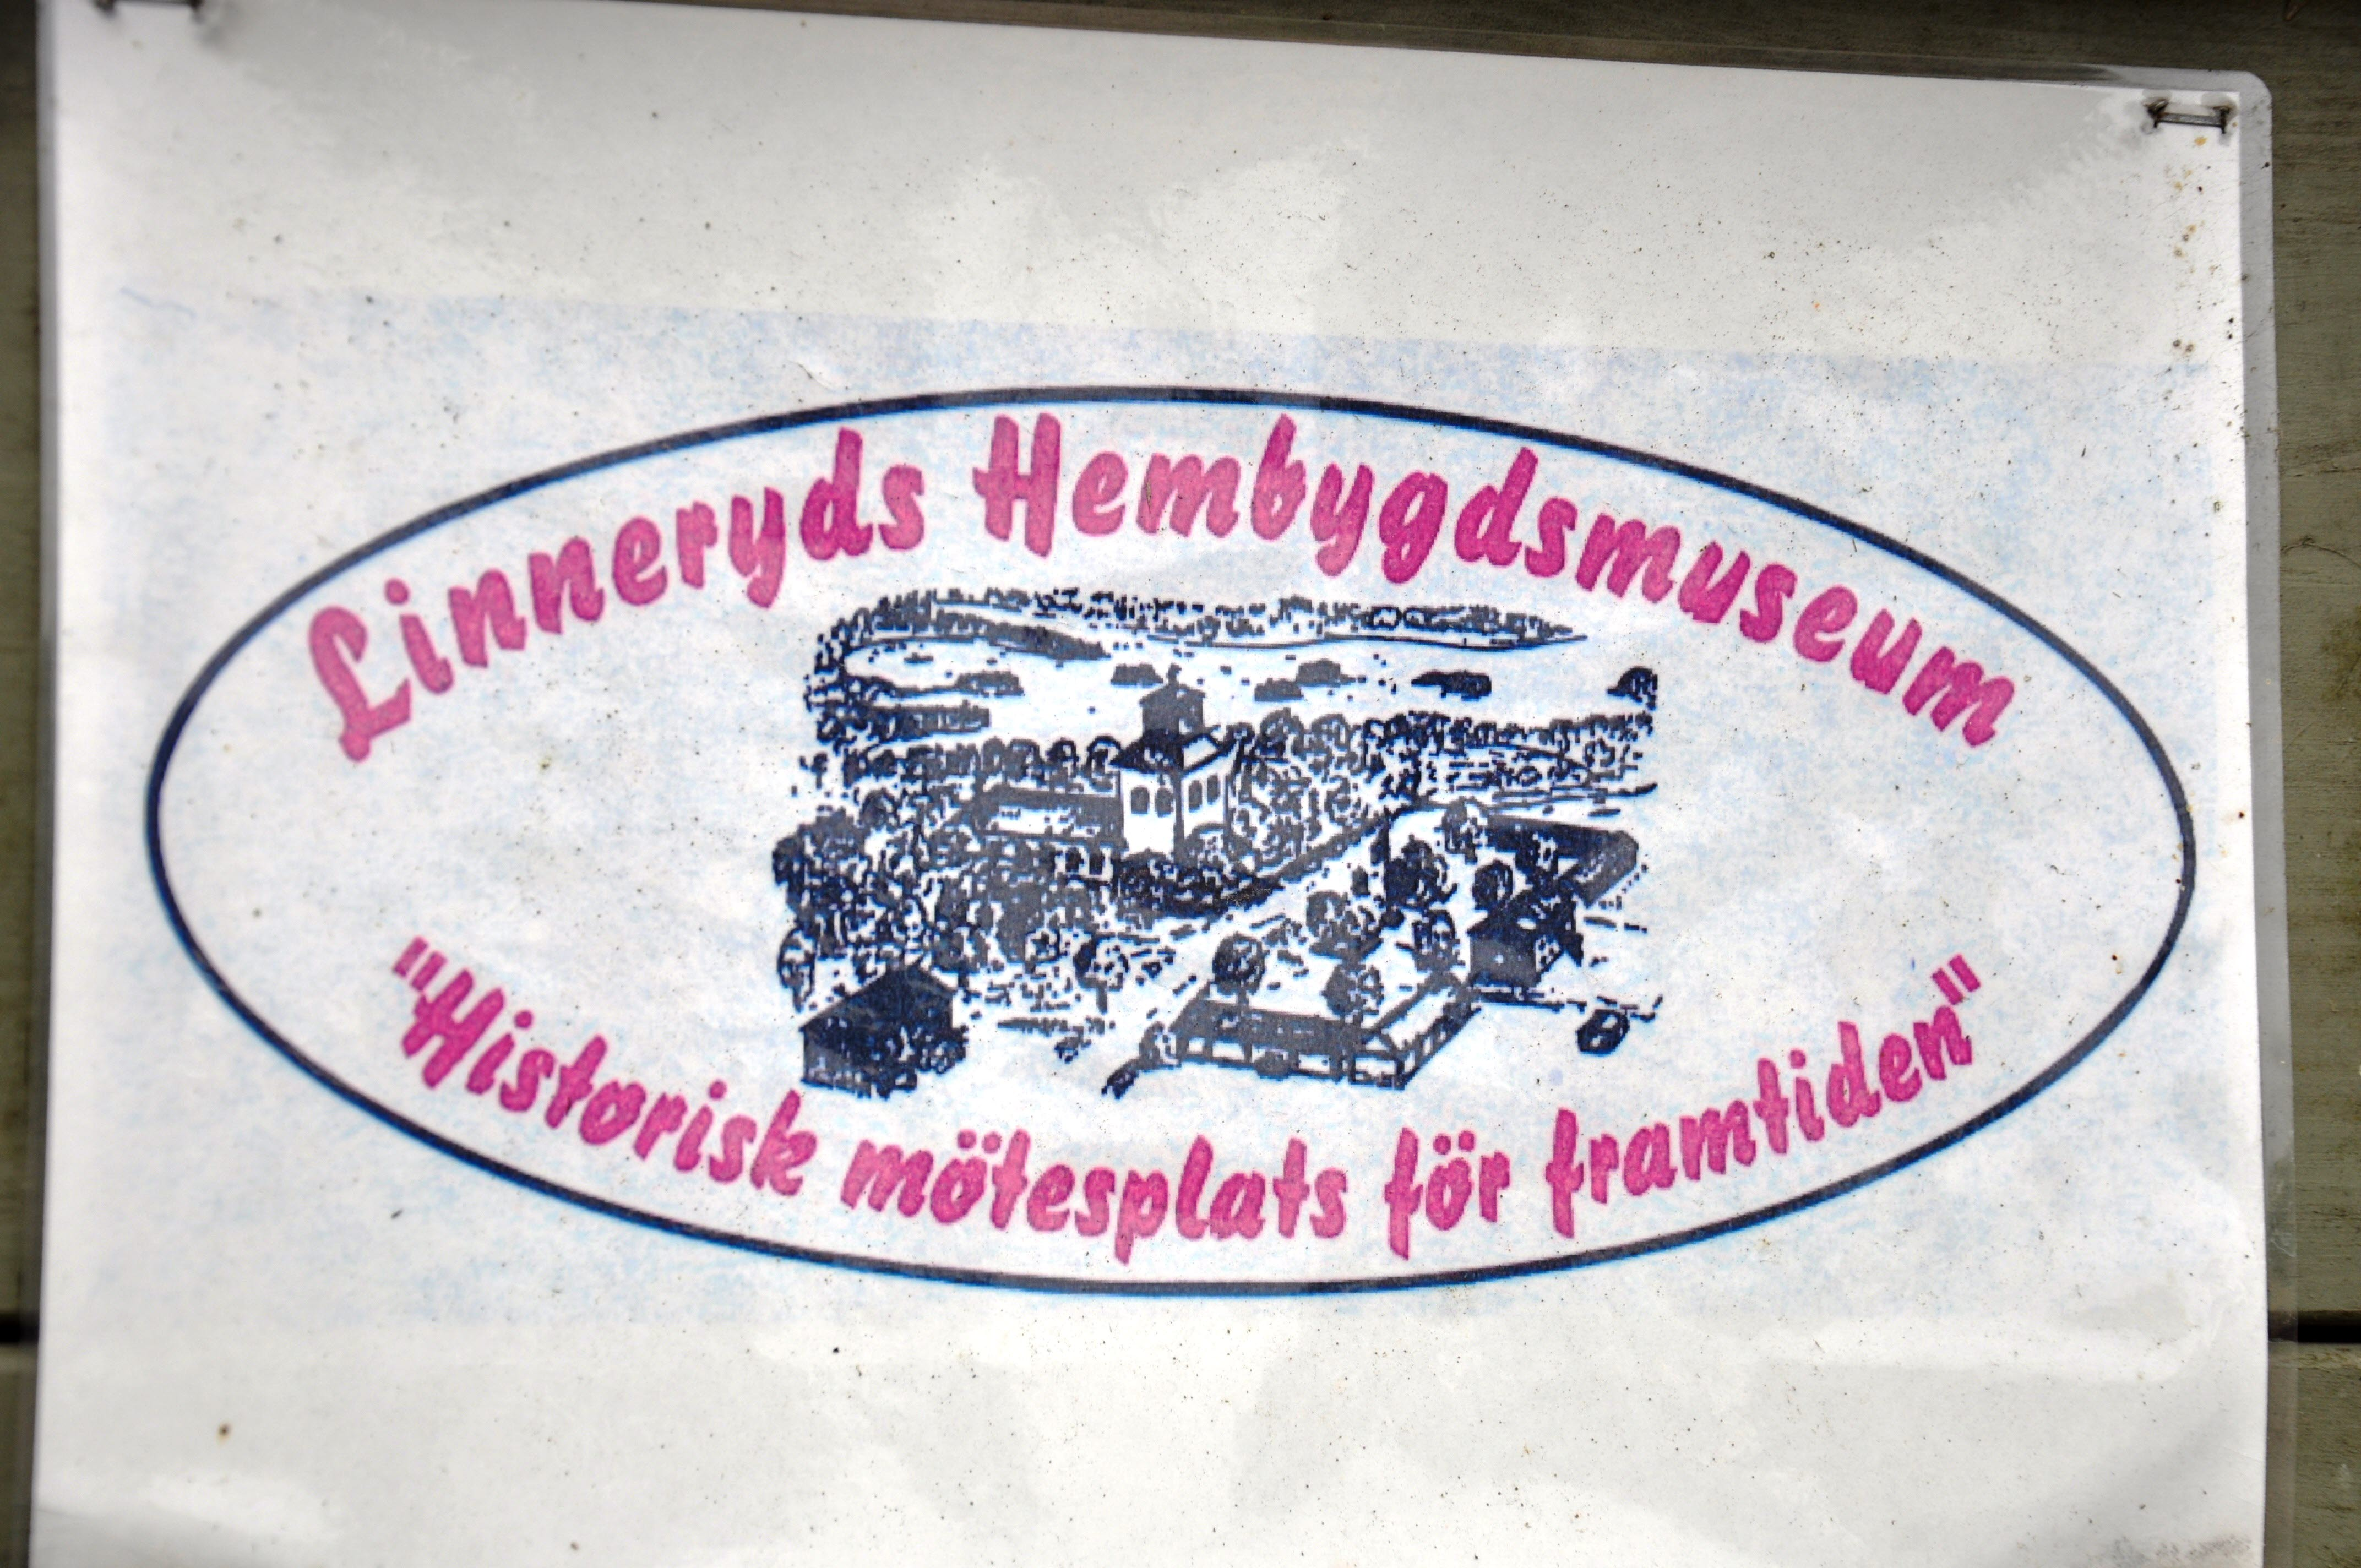 Linneryd grd - Nssj kommun